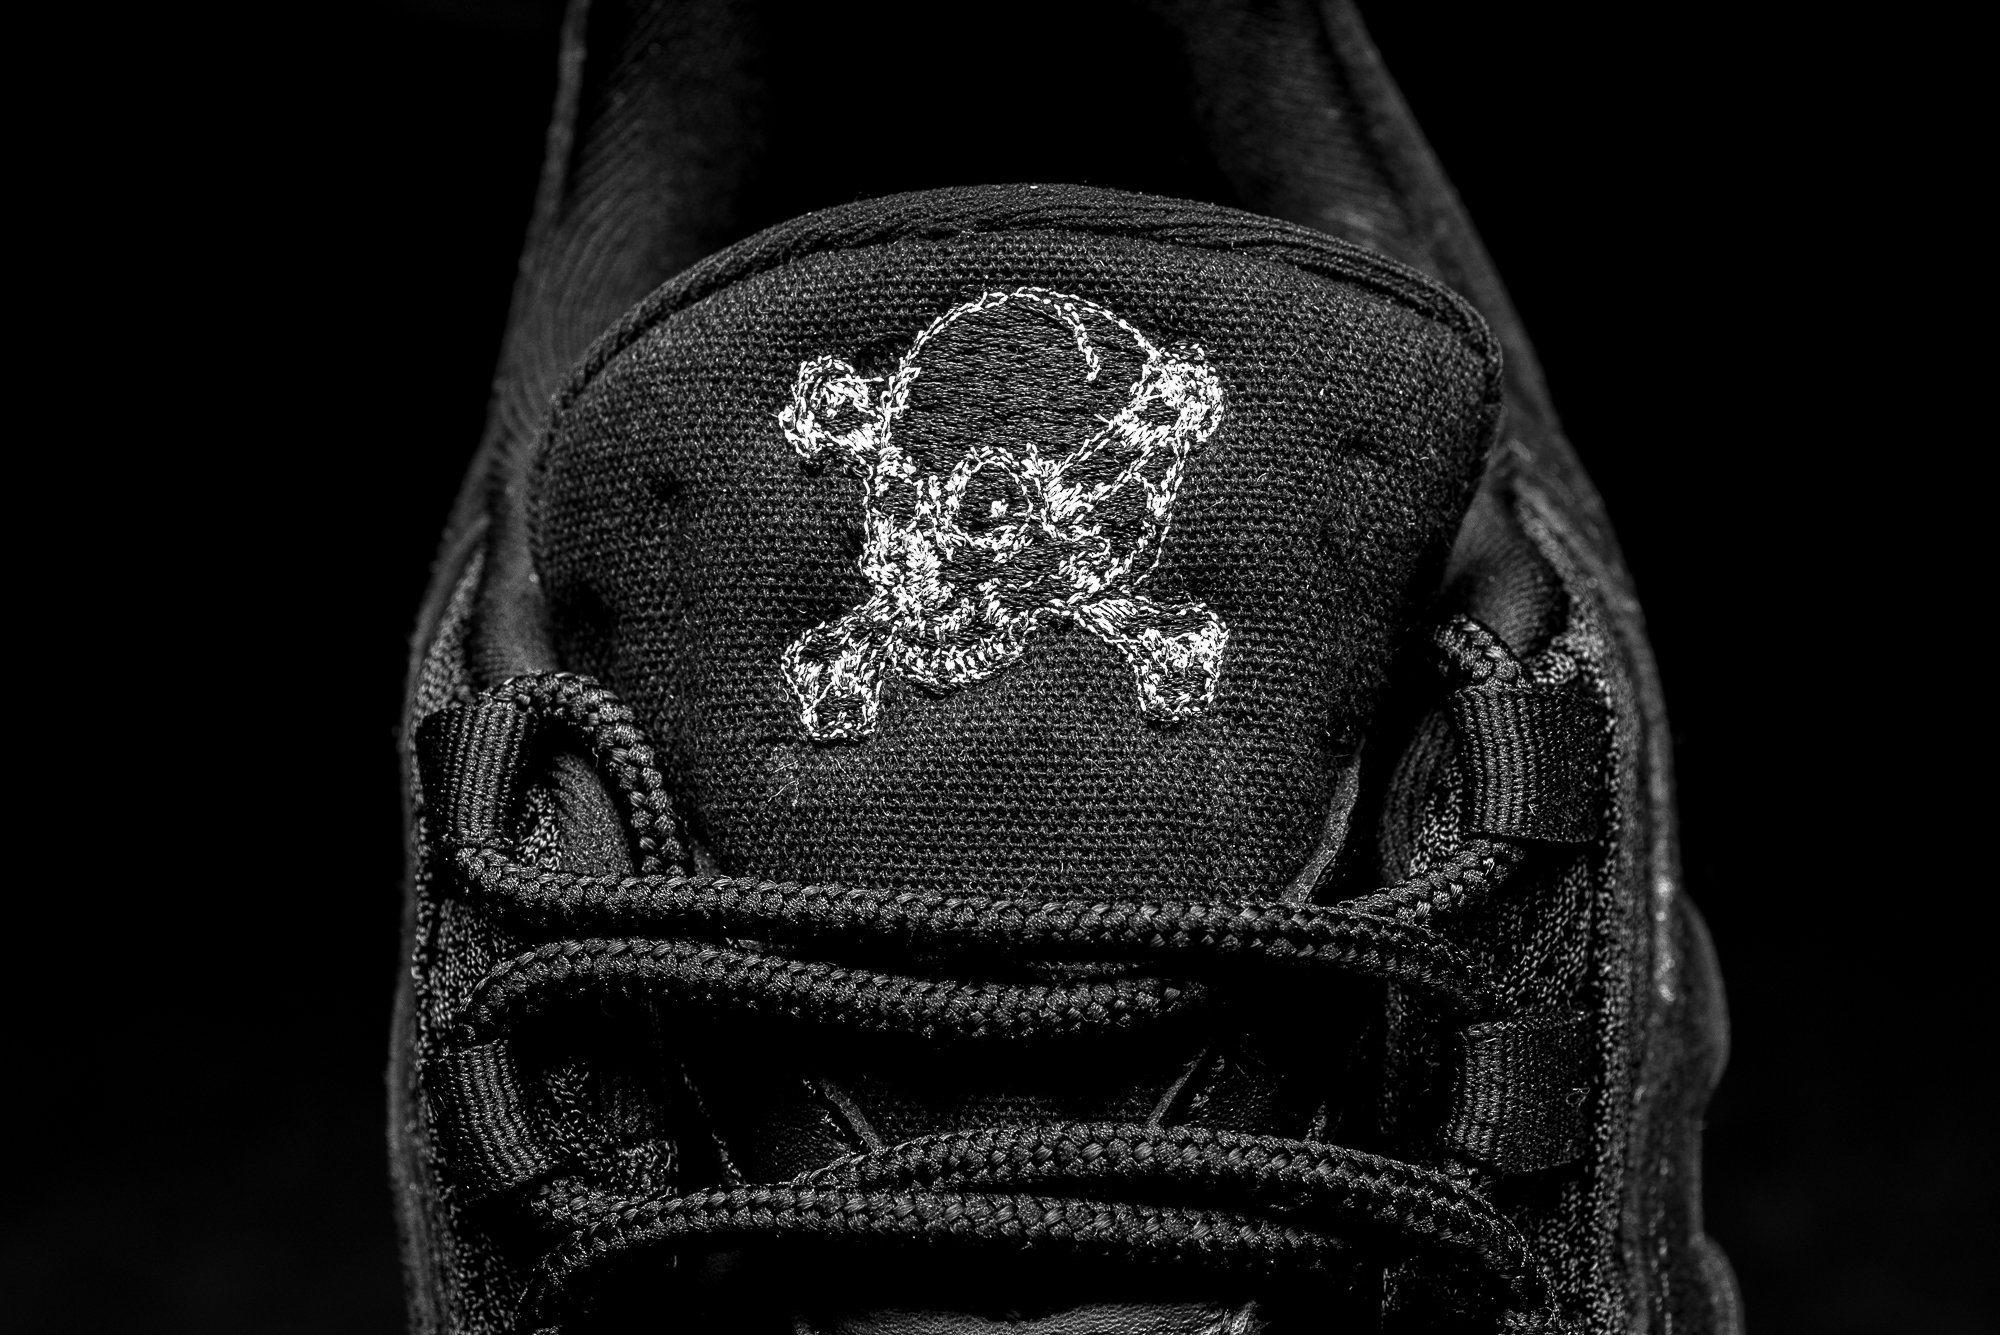 Nike Air Max 90 Premium 'Rebel Skull' BlackChrome